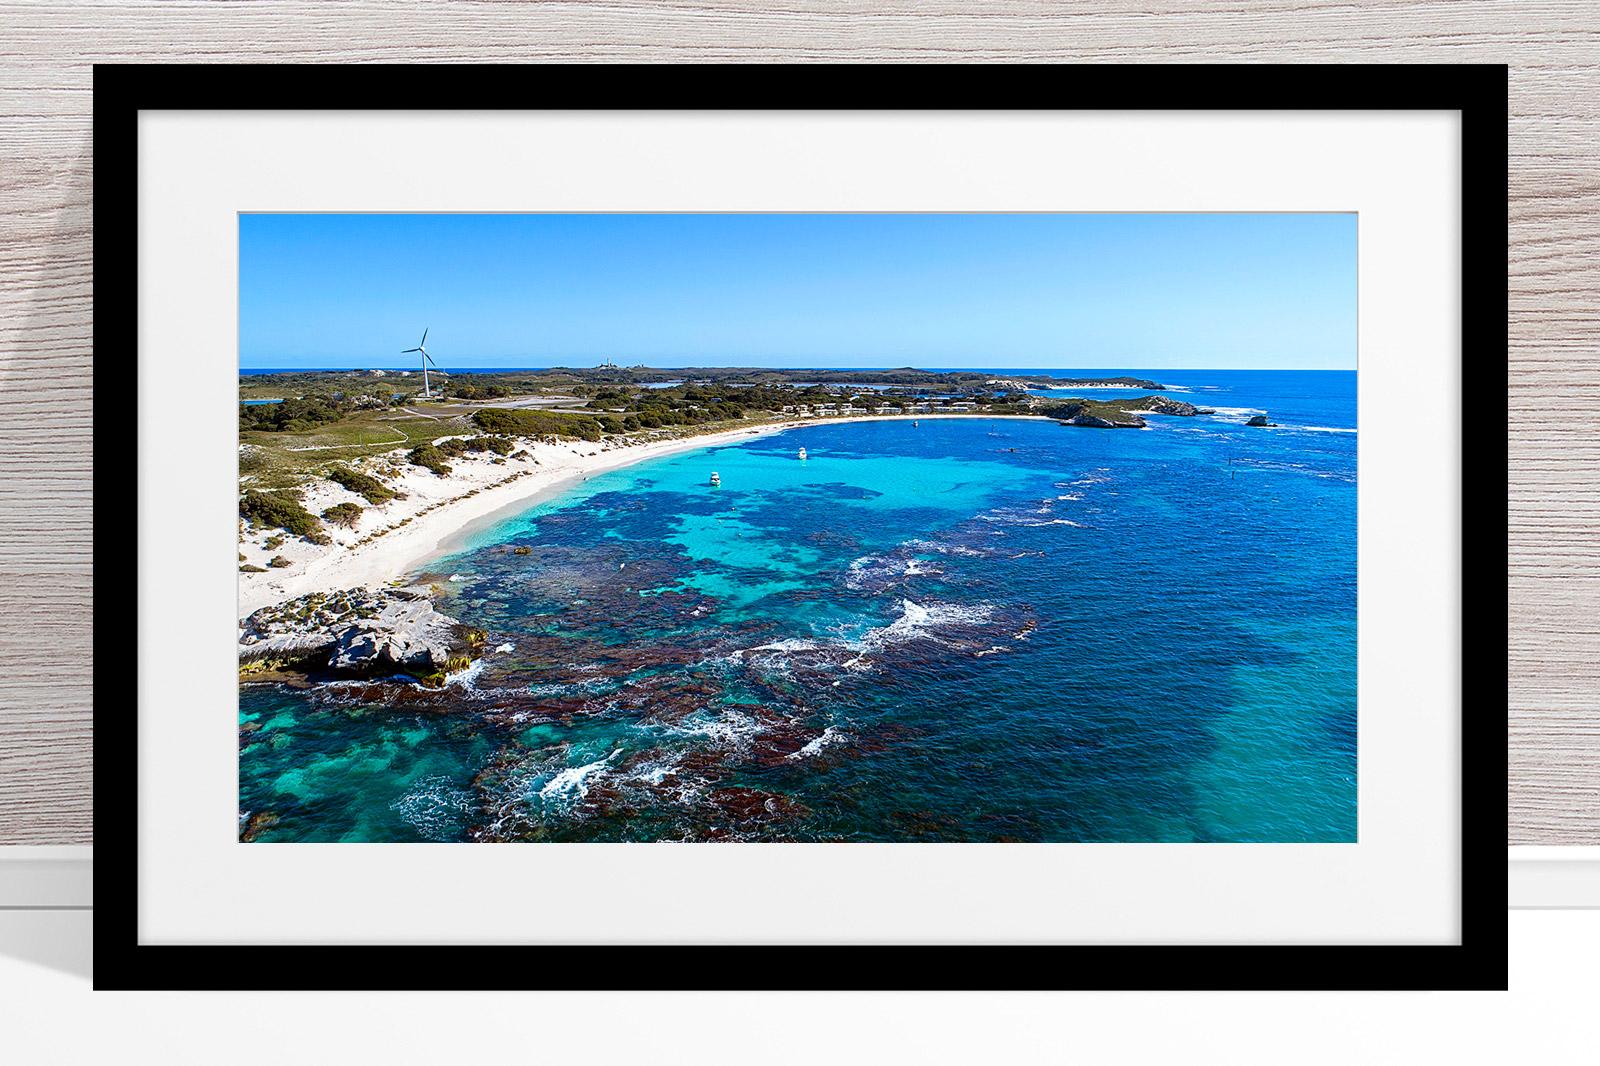 Jason Mazur - 'Longreach Bay, Rottnest' 063 Black Frame